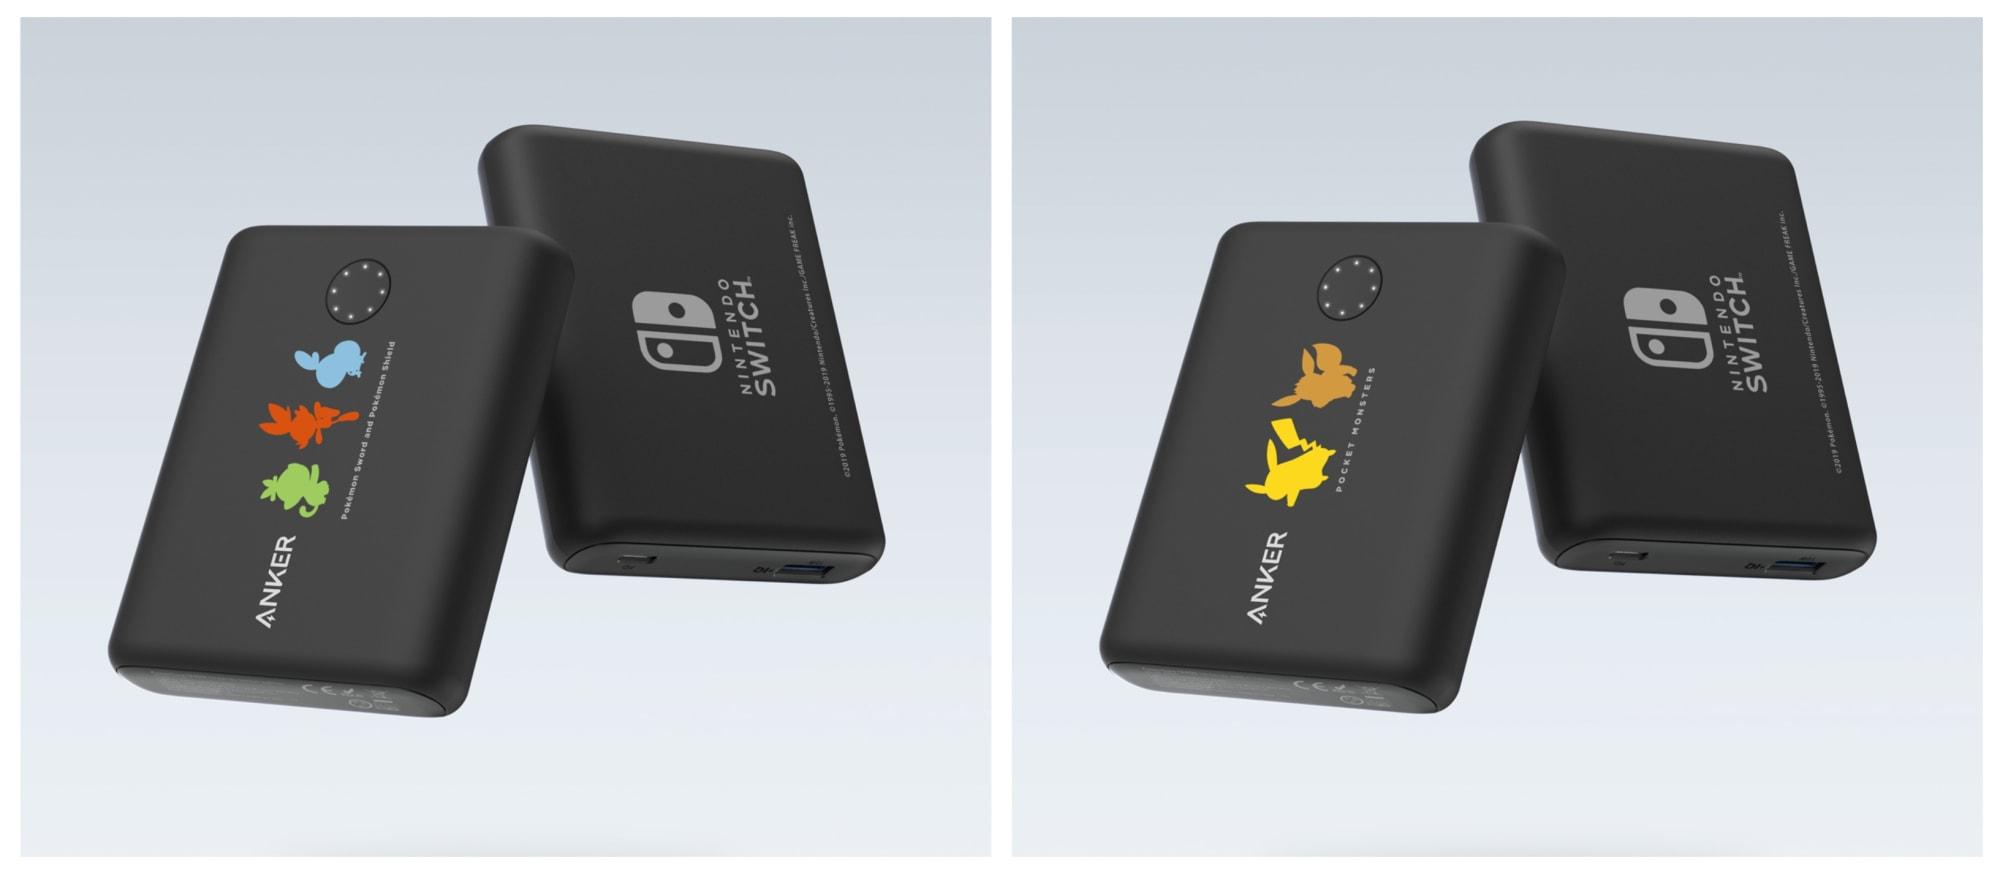 Anker PowerCore 13400 Pokémon Limited Edition